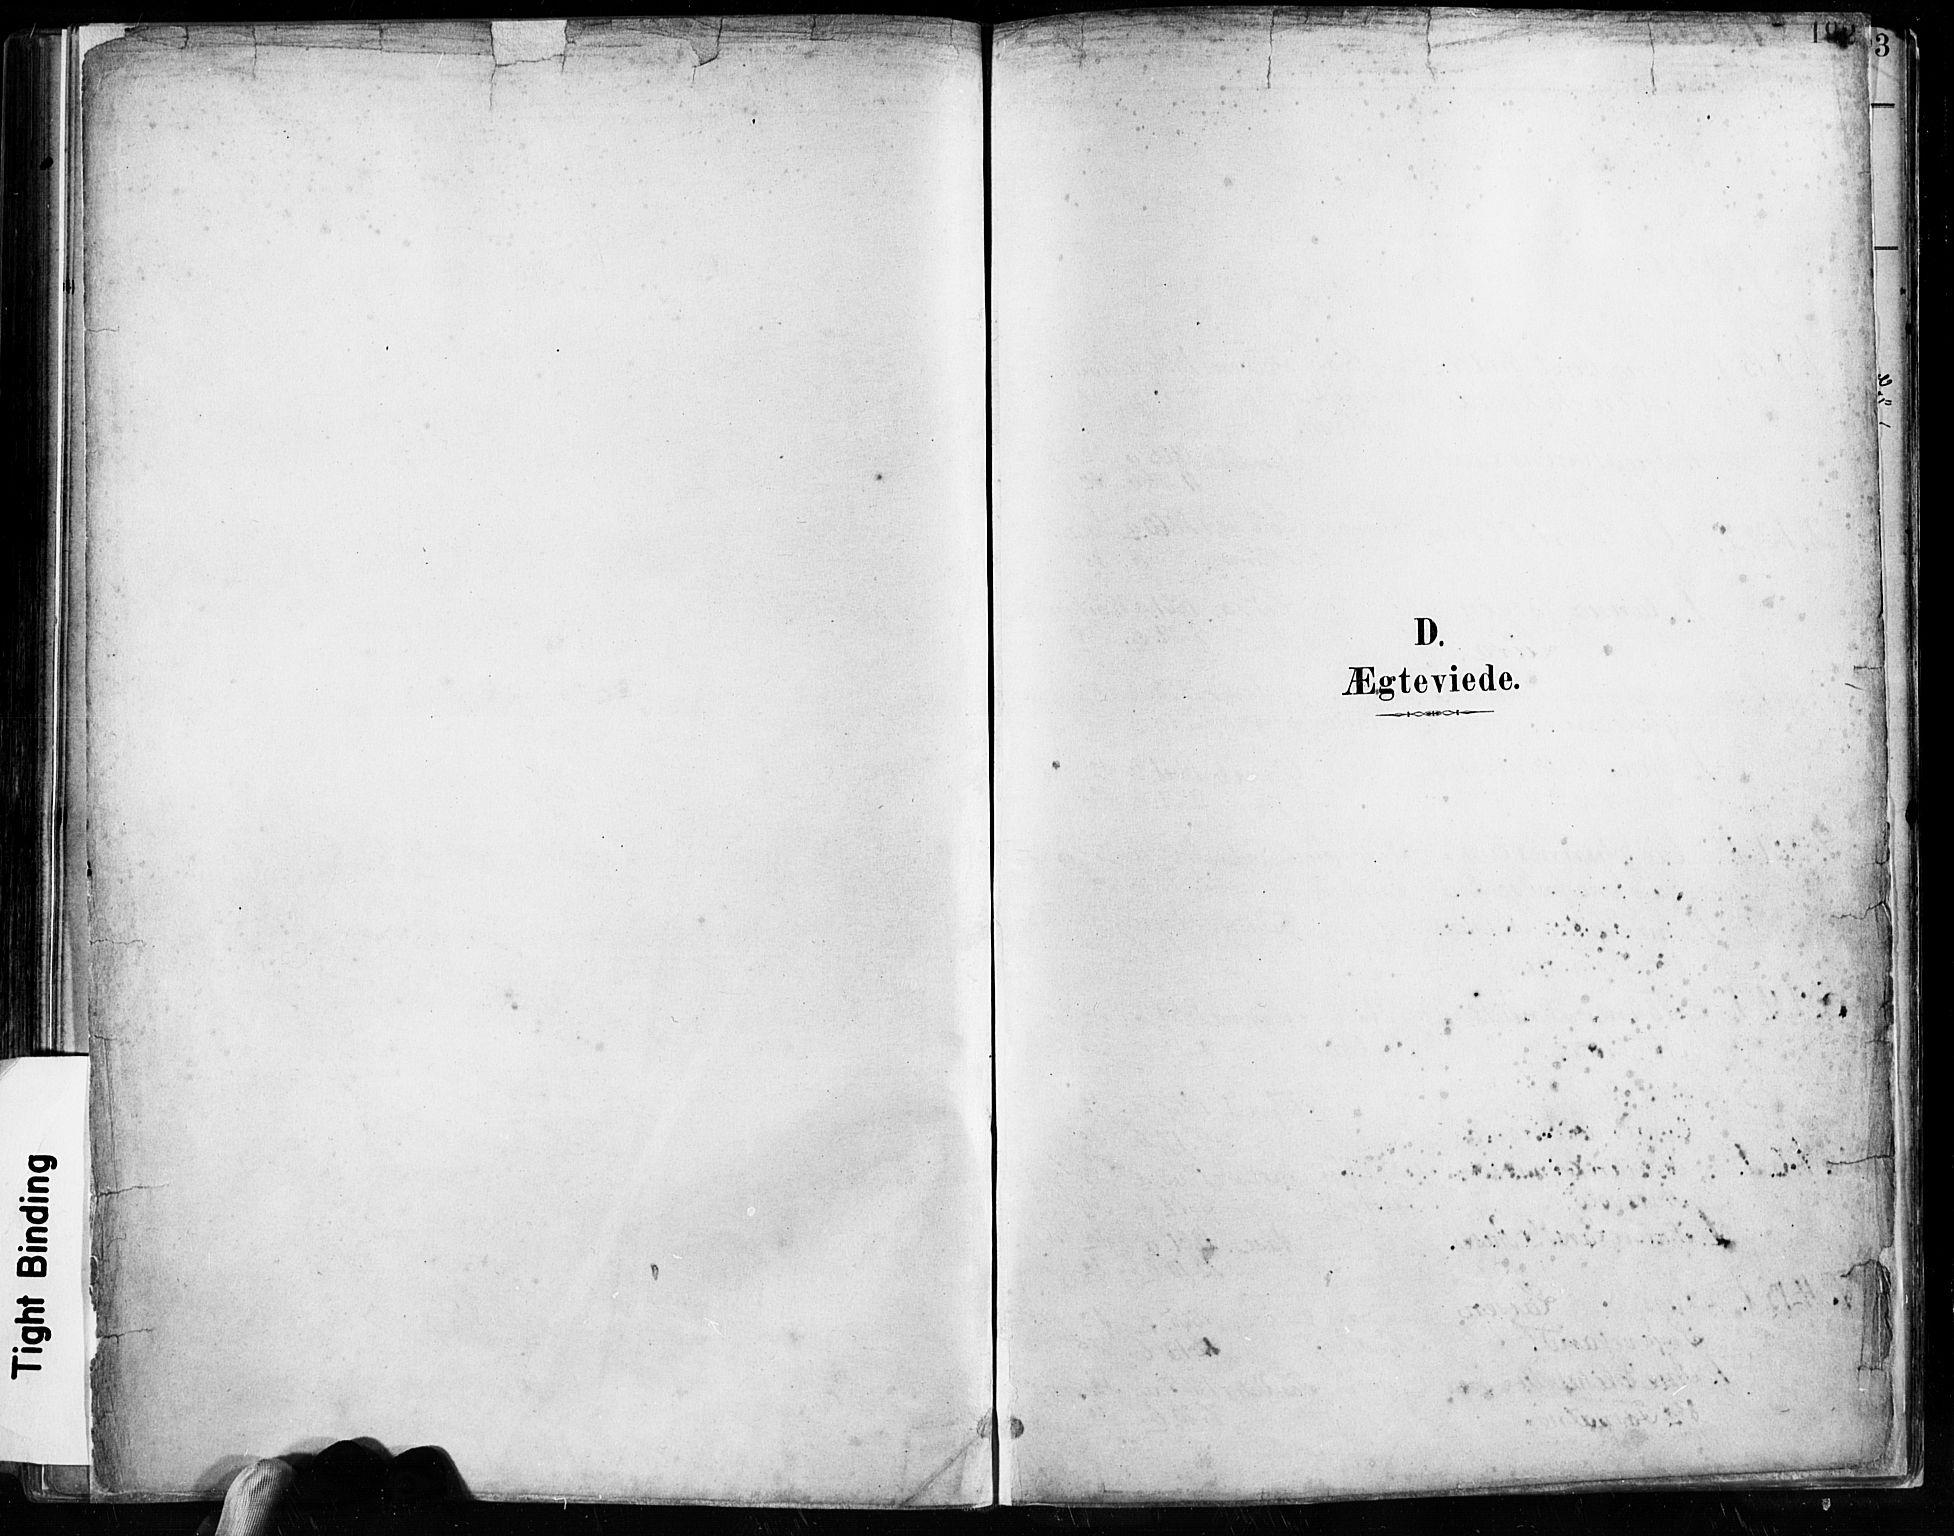 SAST, Høyland sokneprestkontor, 30BA/L0013: Ministerialbok nr. A 13.1, 1889-1898, s. 192